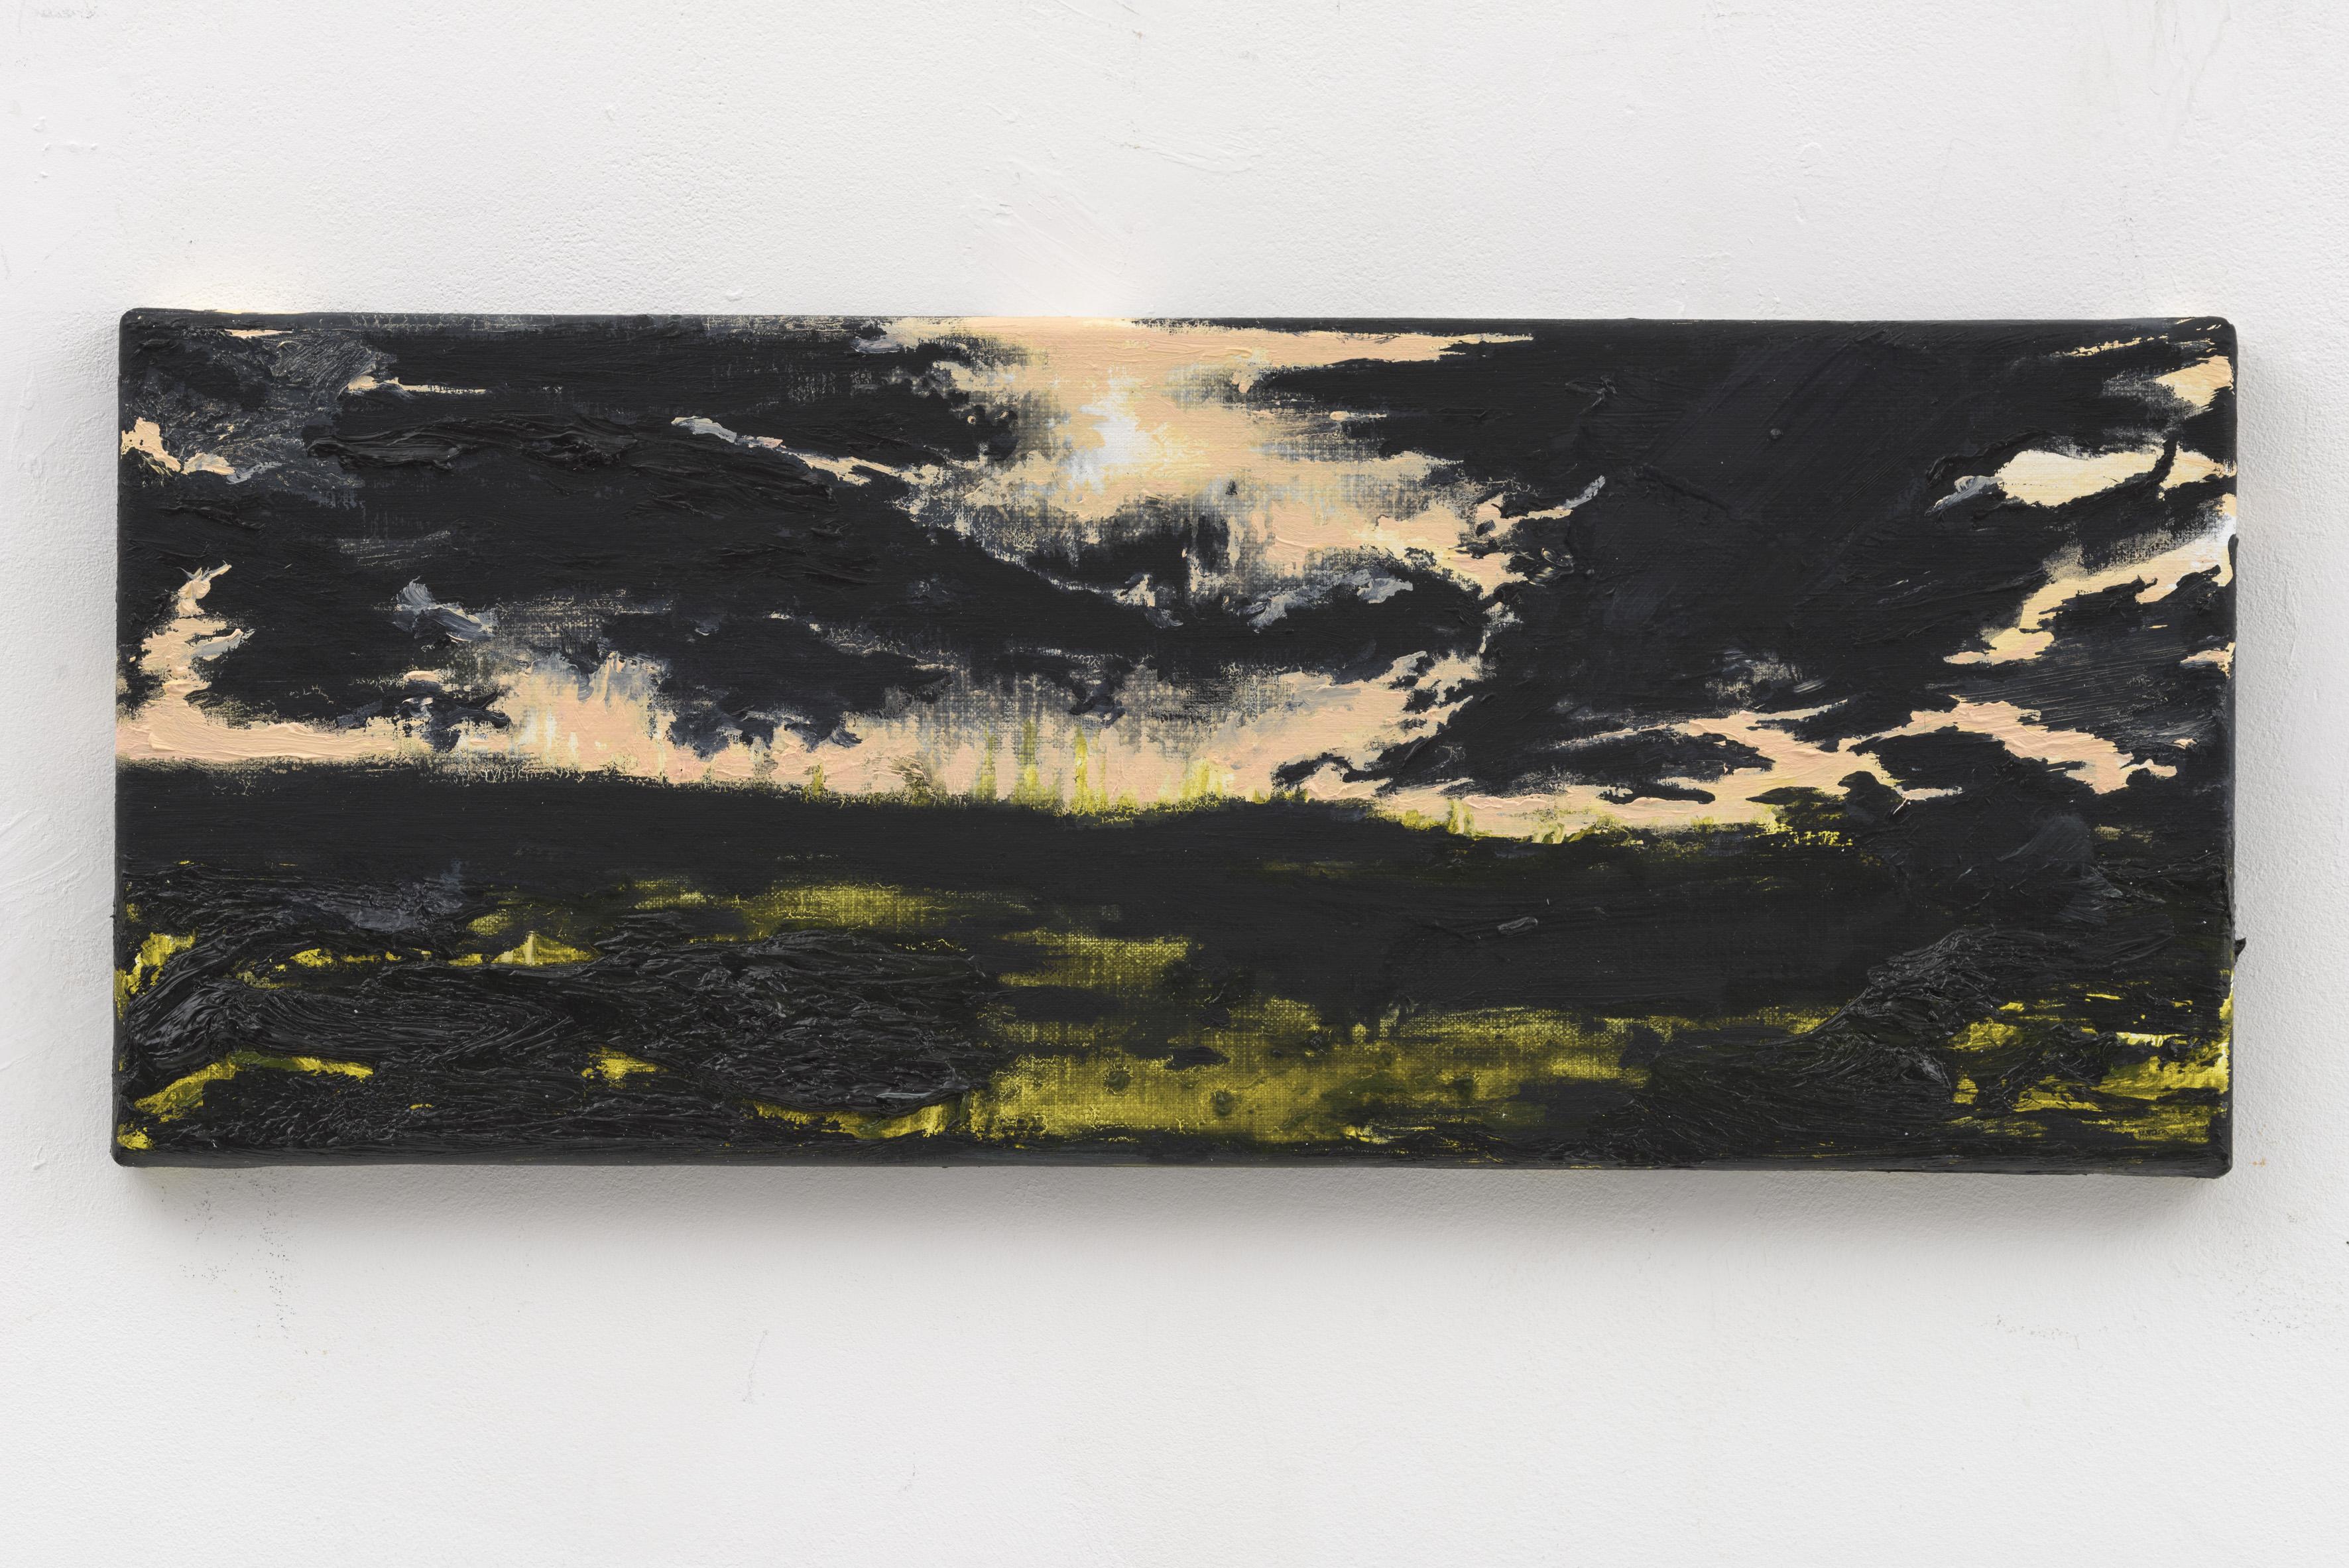 """Resonating Landscapes IX"" 20 x 50 cm. oil on linen 2017"